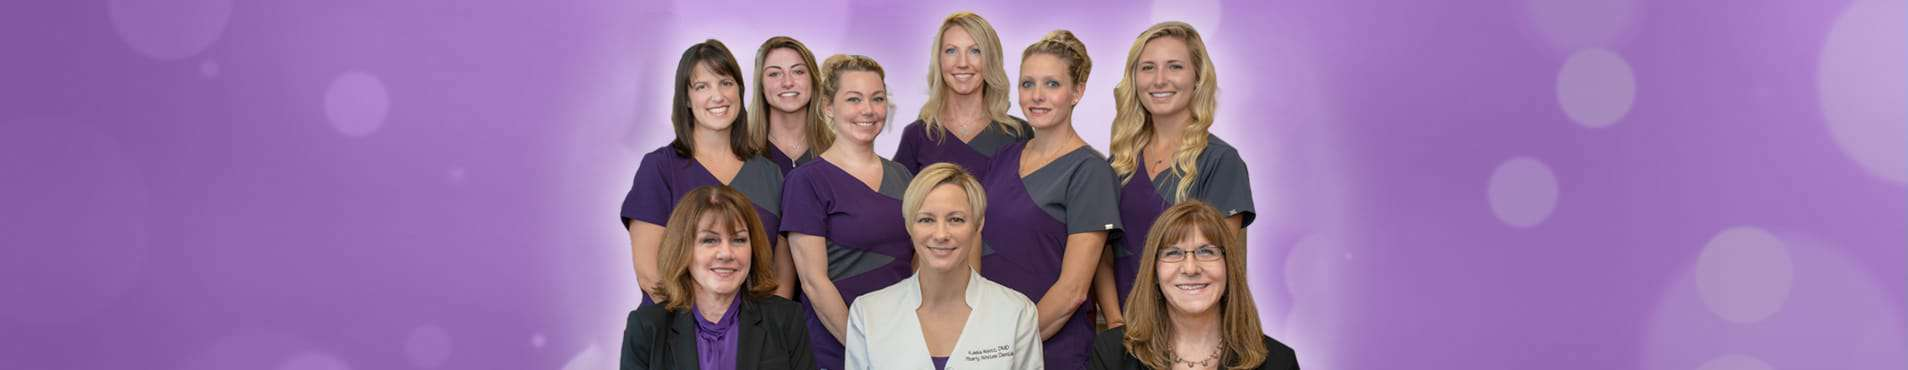 Dental Crowns Dentist Serving Hightstown